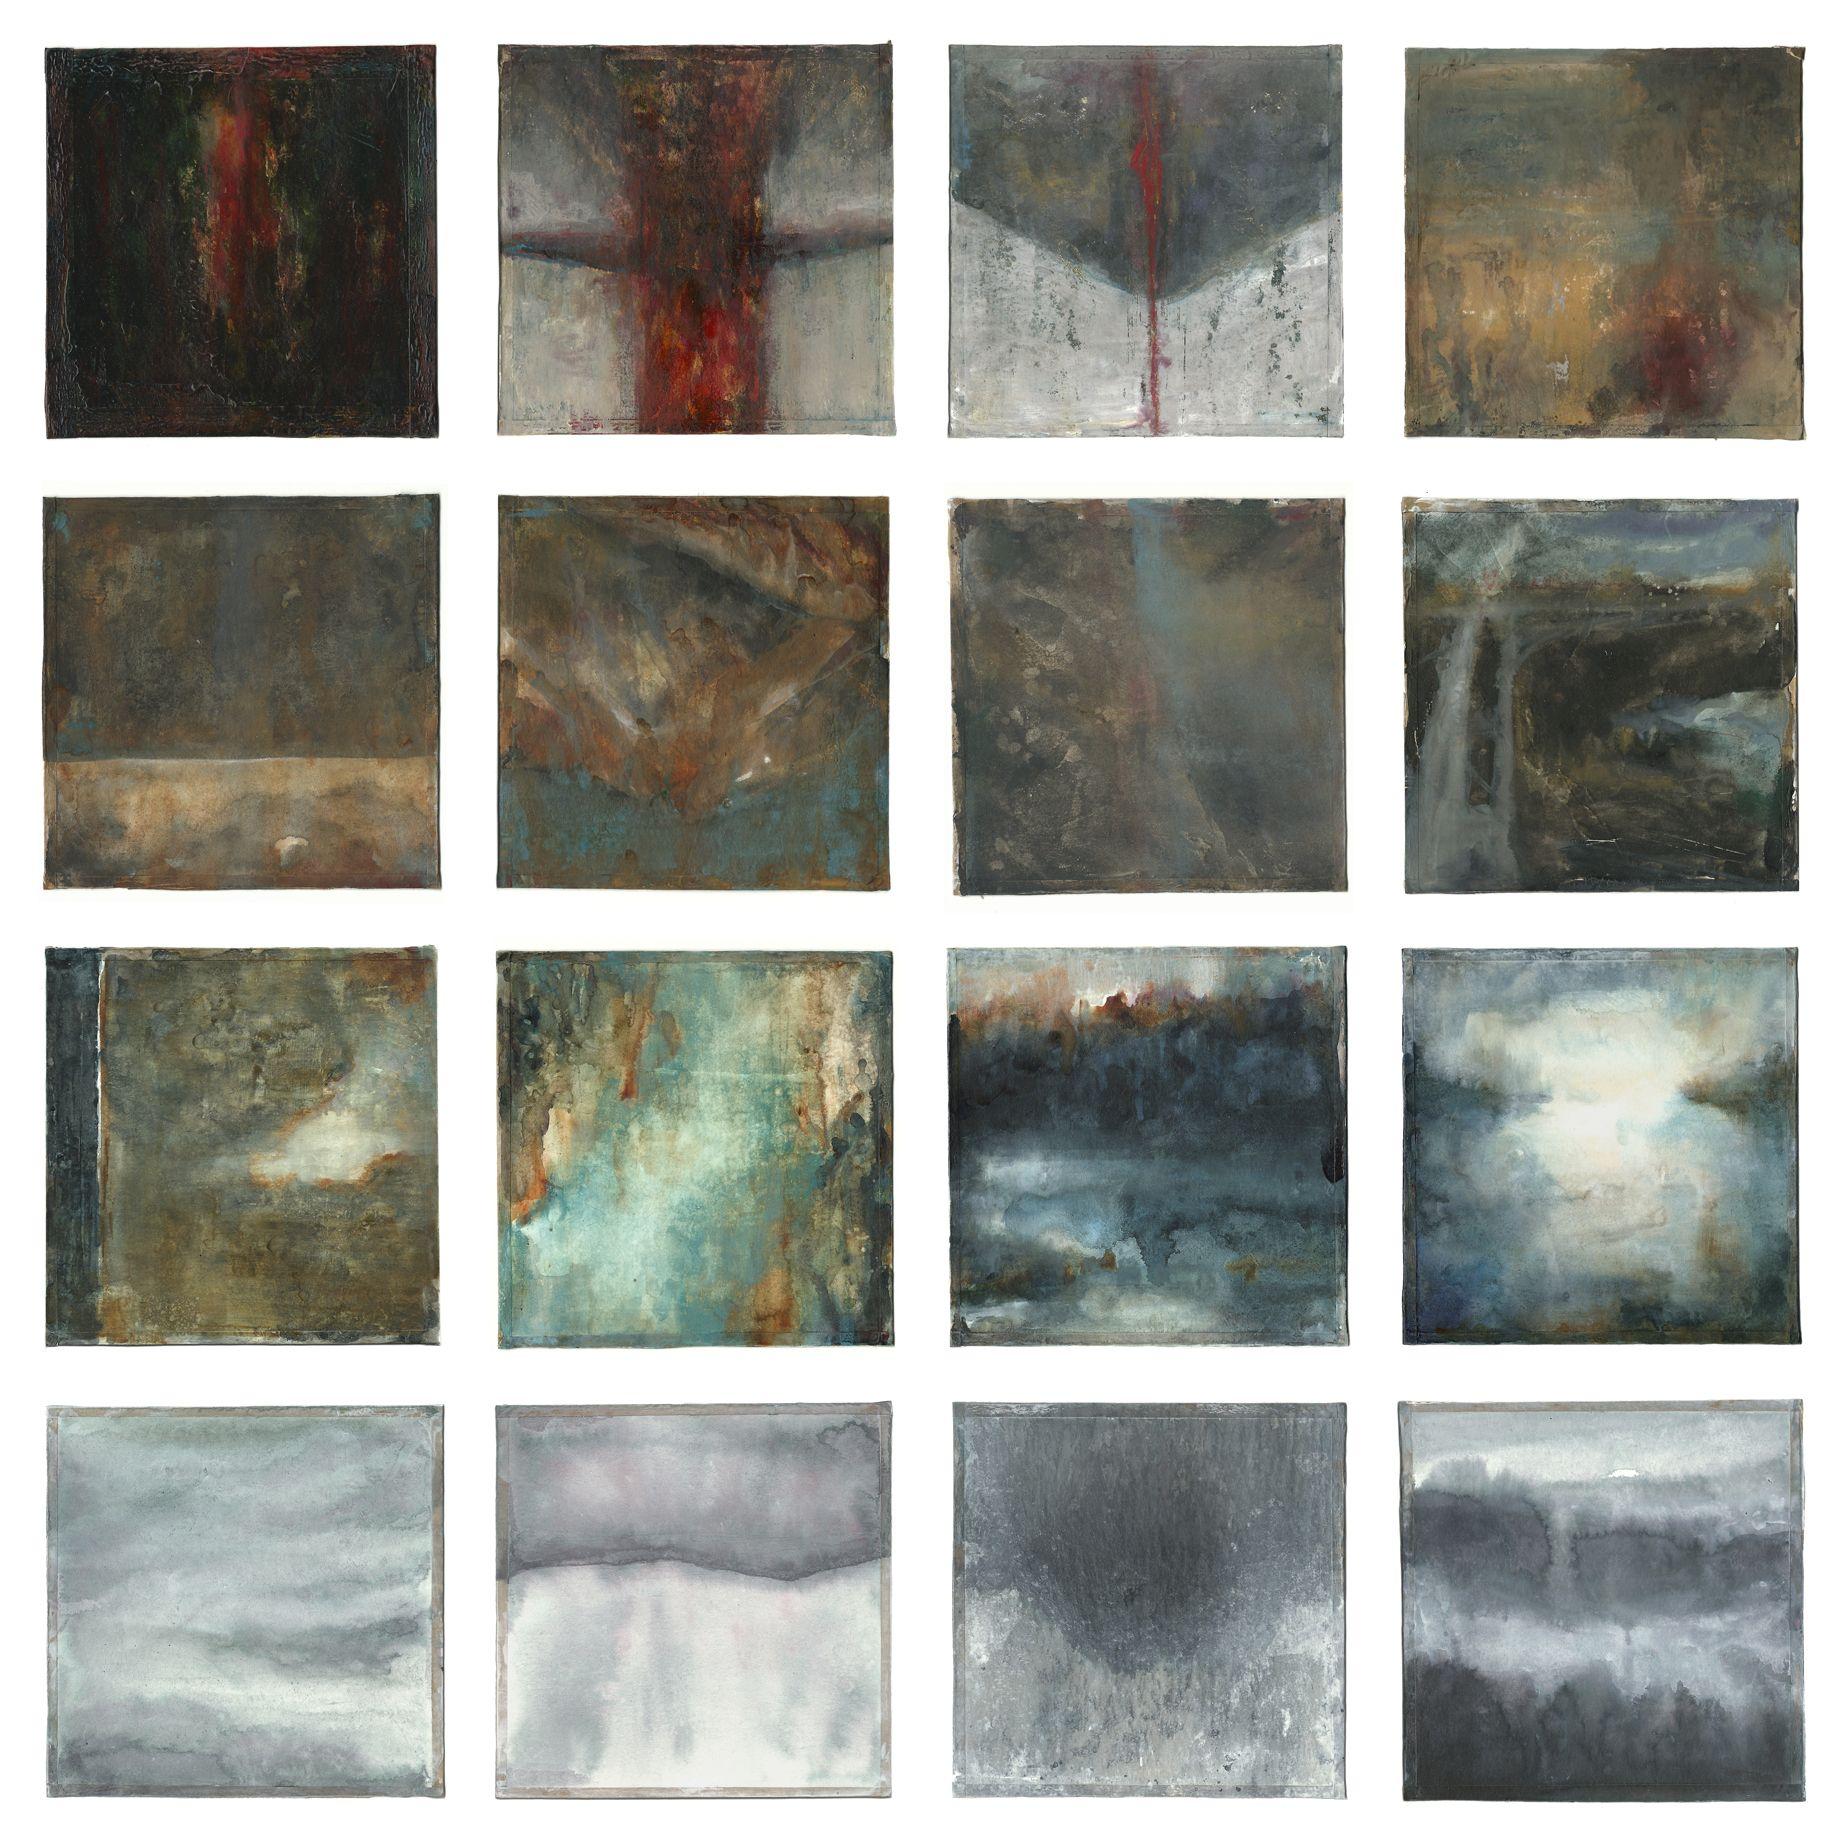 Elements - mixed media on paper, 60x60 cm by Stefano Zampieri